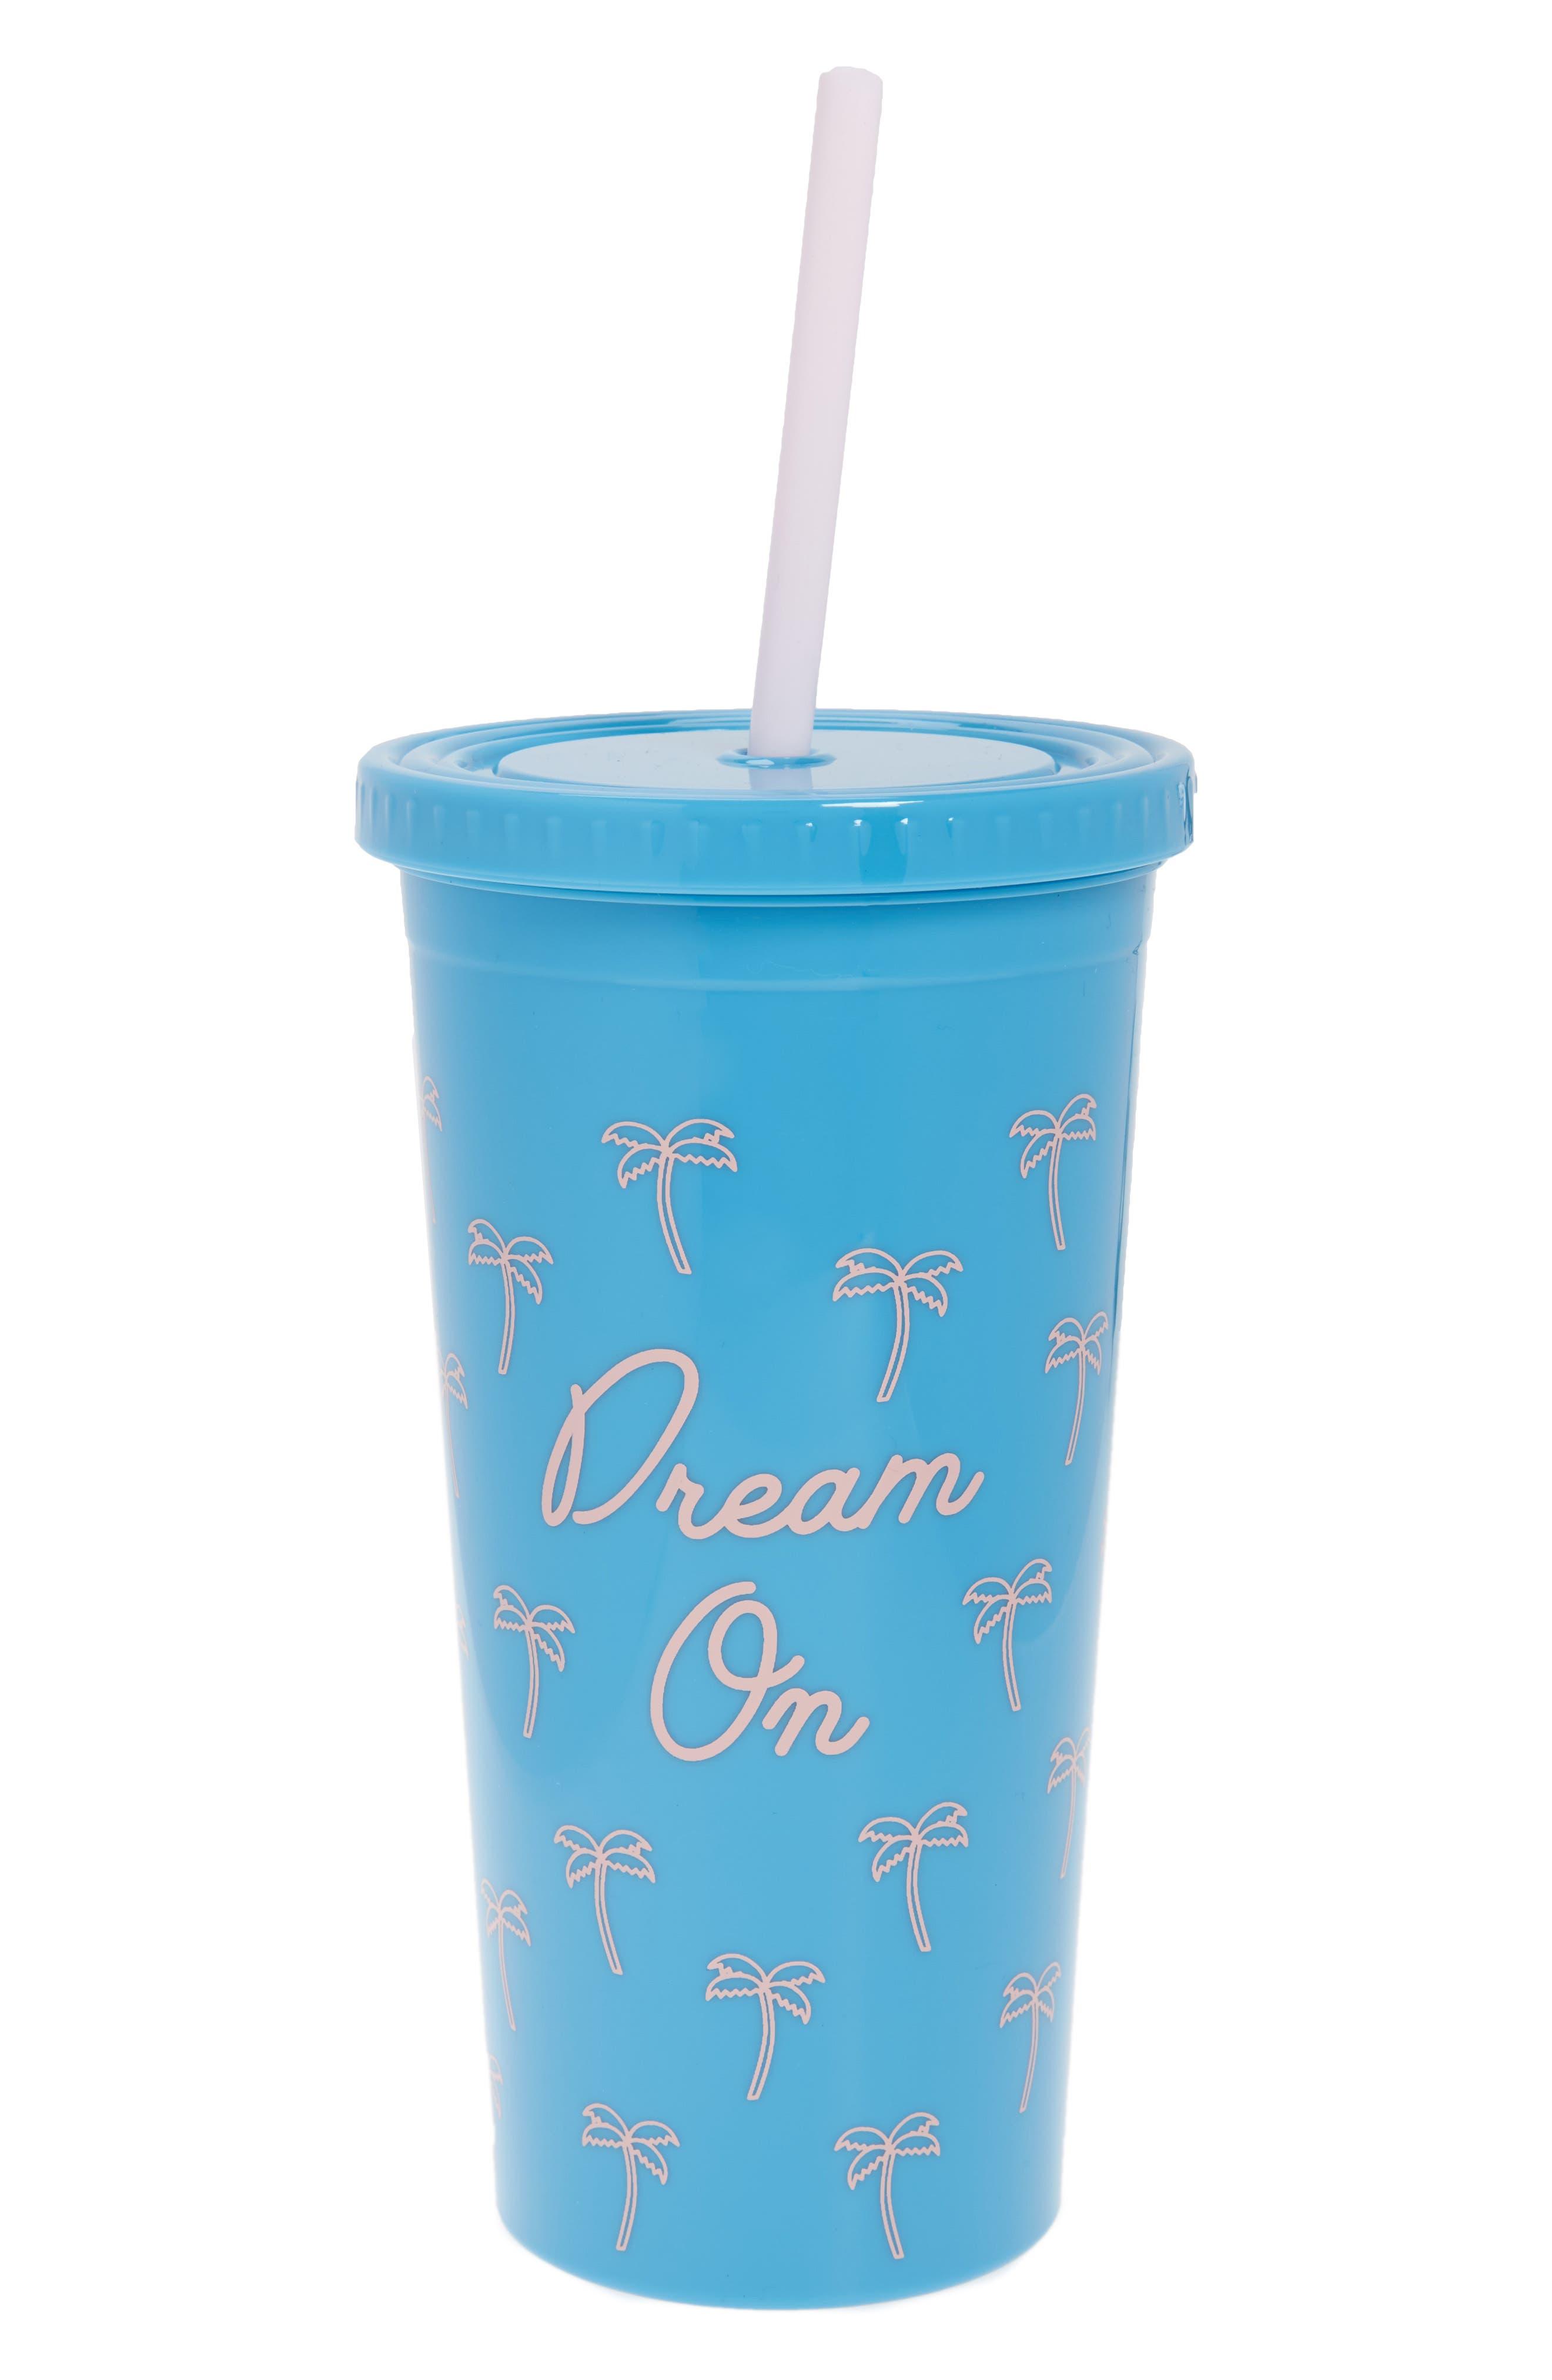 Dream On Tumbler & Straw,                             Main thumbnail 1, color,                             Blue